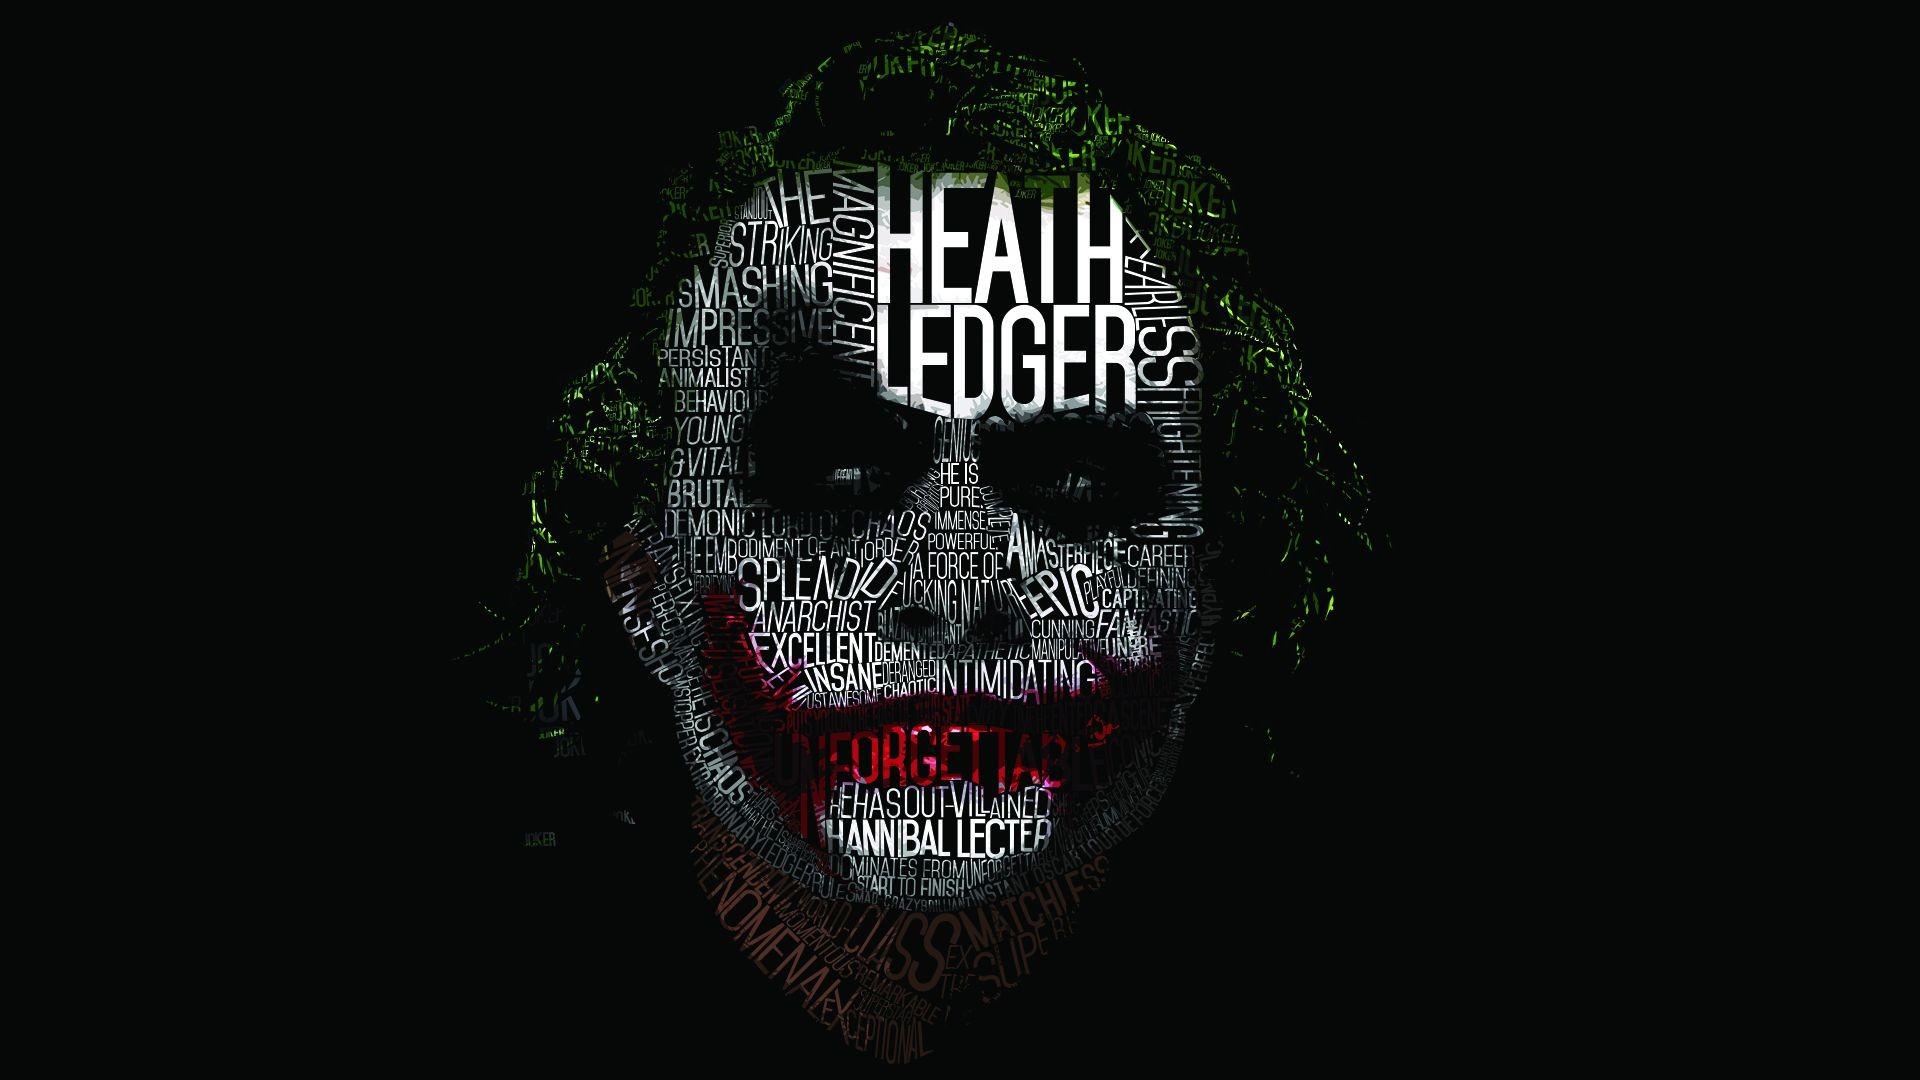 Heath Ledger Joker Wallpaper HD